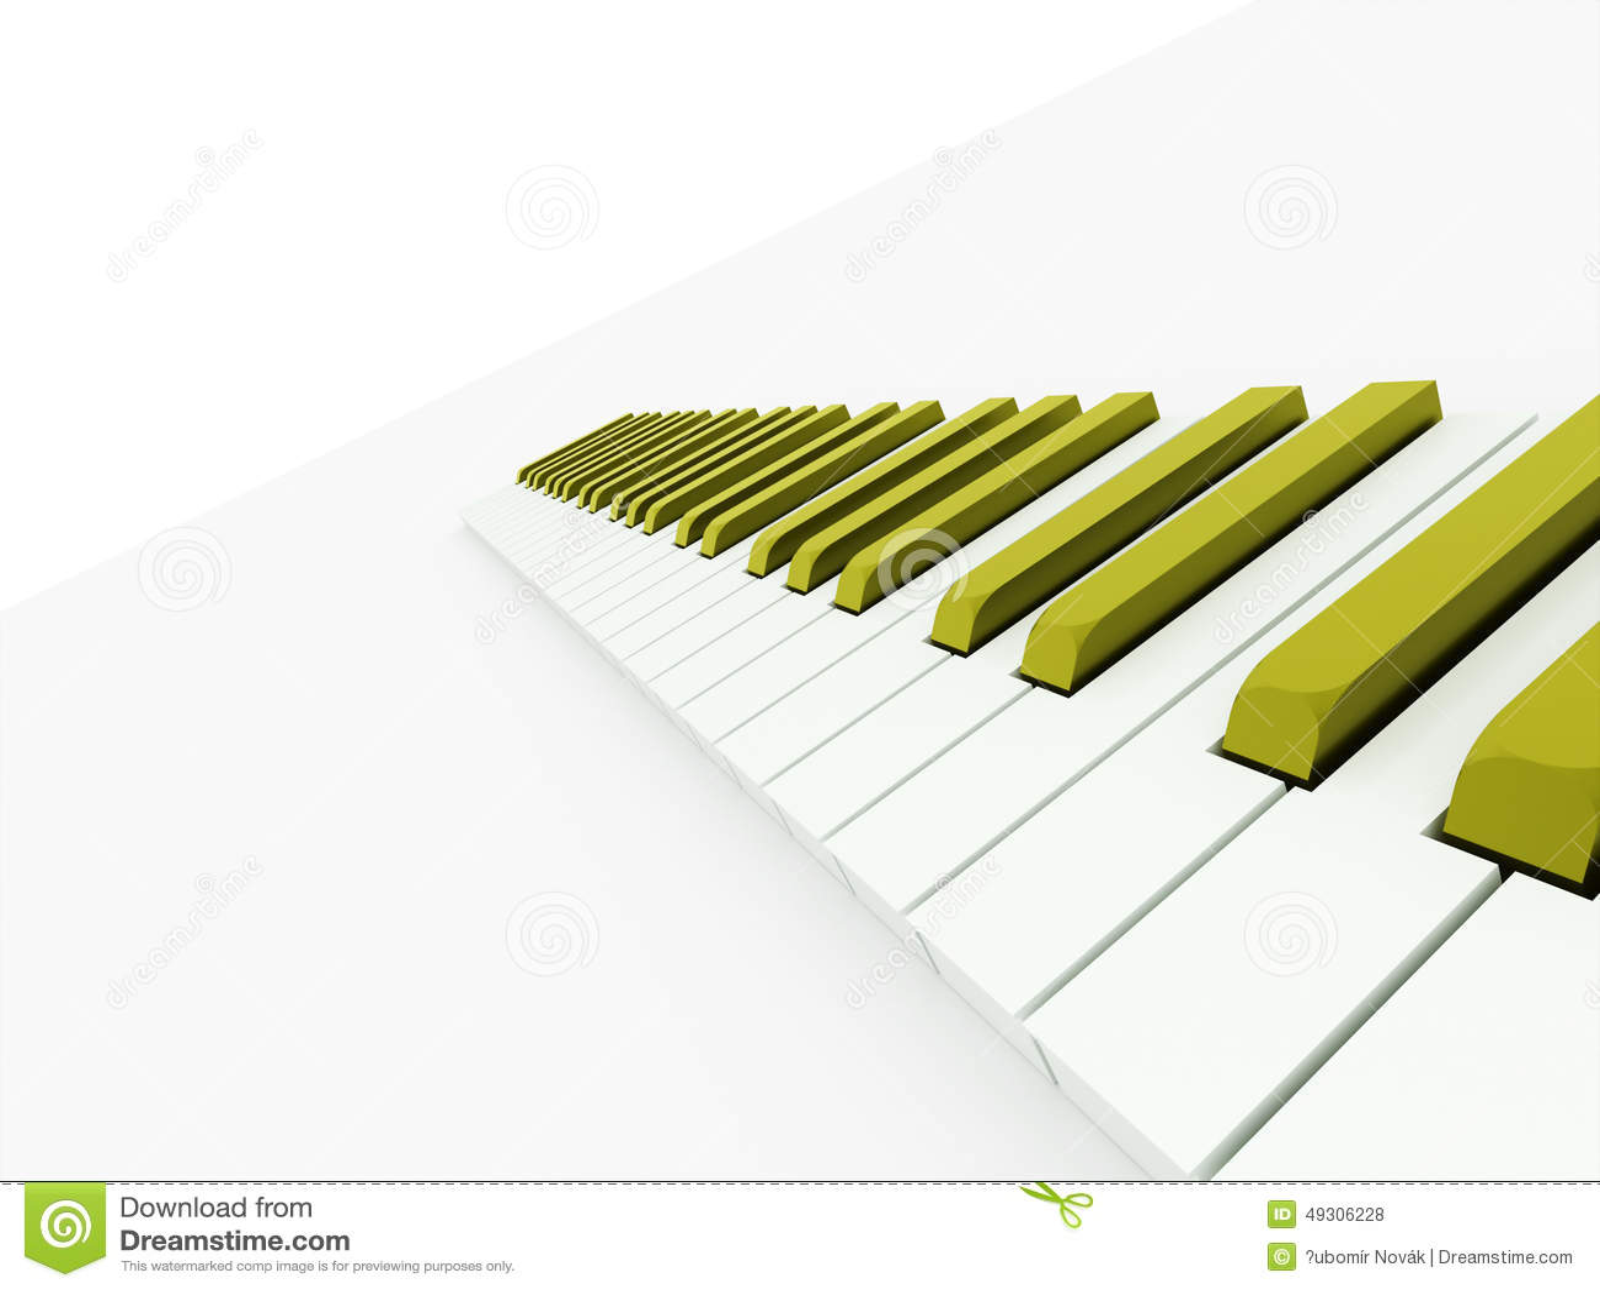 clavier de piano vert rendu illustration stock. Black Bedroom Furniture Sets. Home Design Ideas